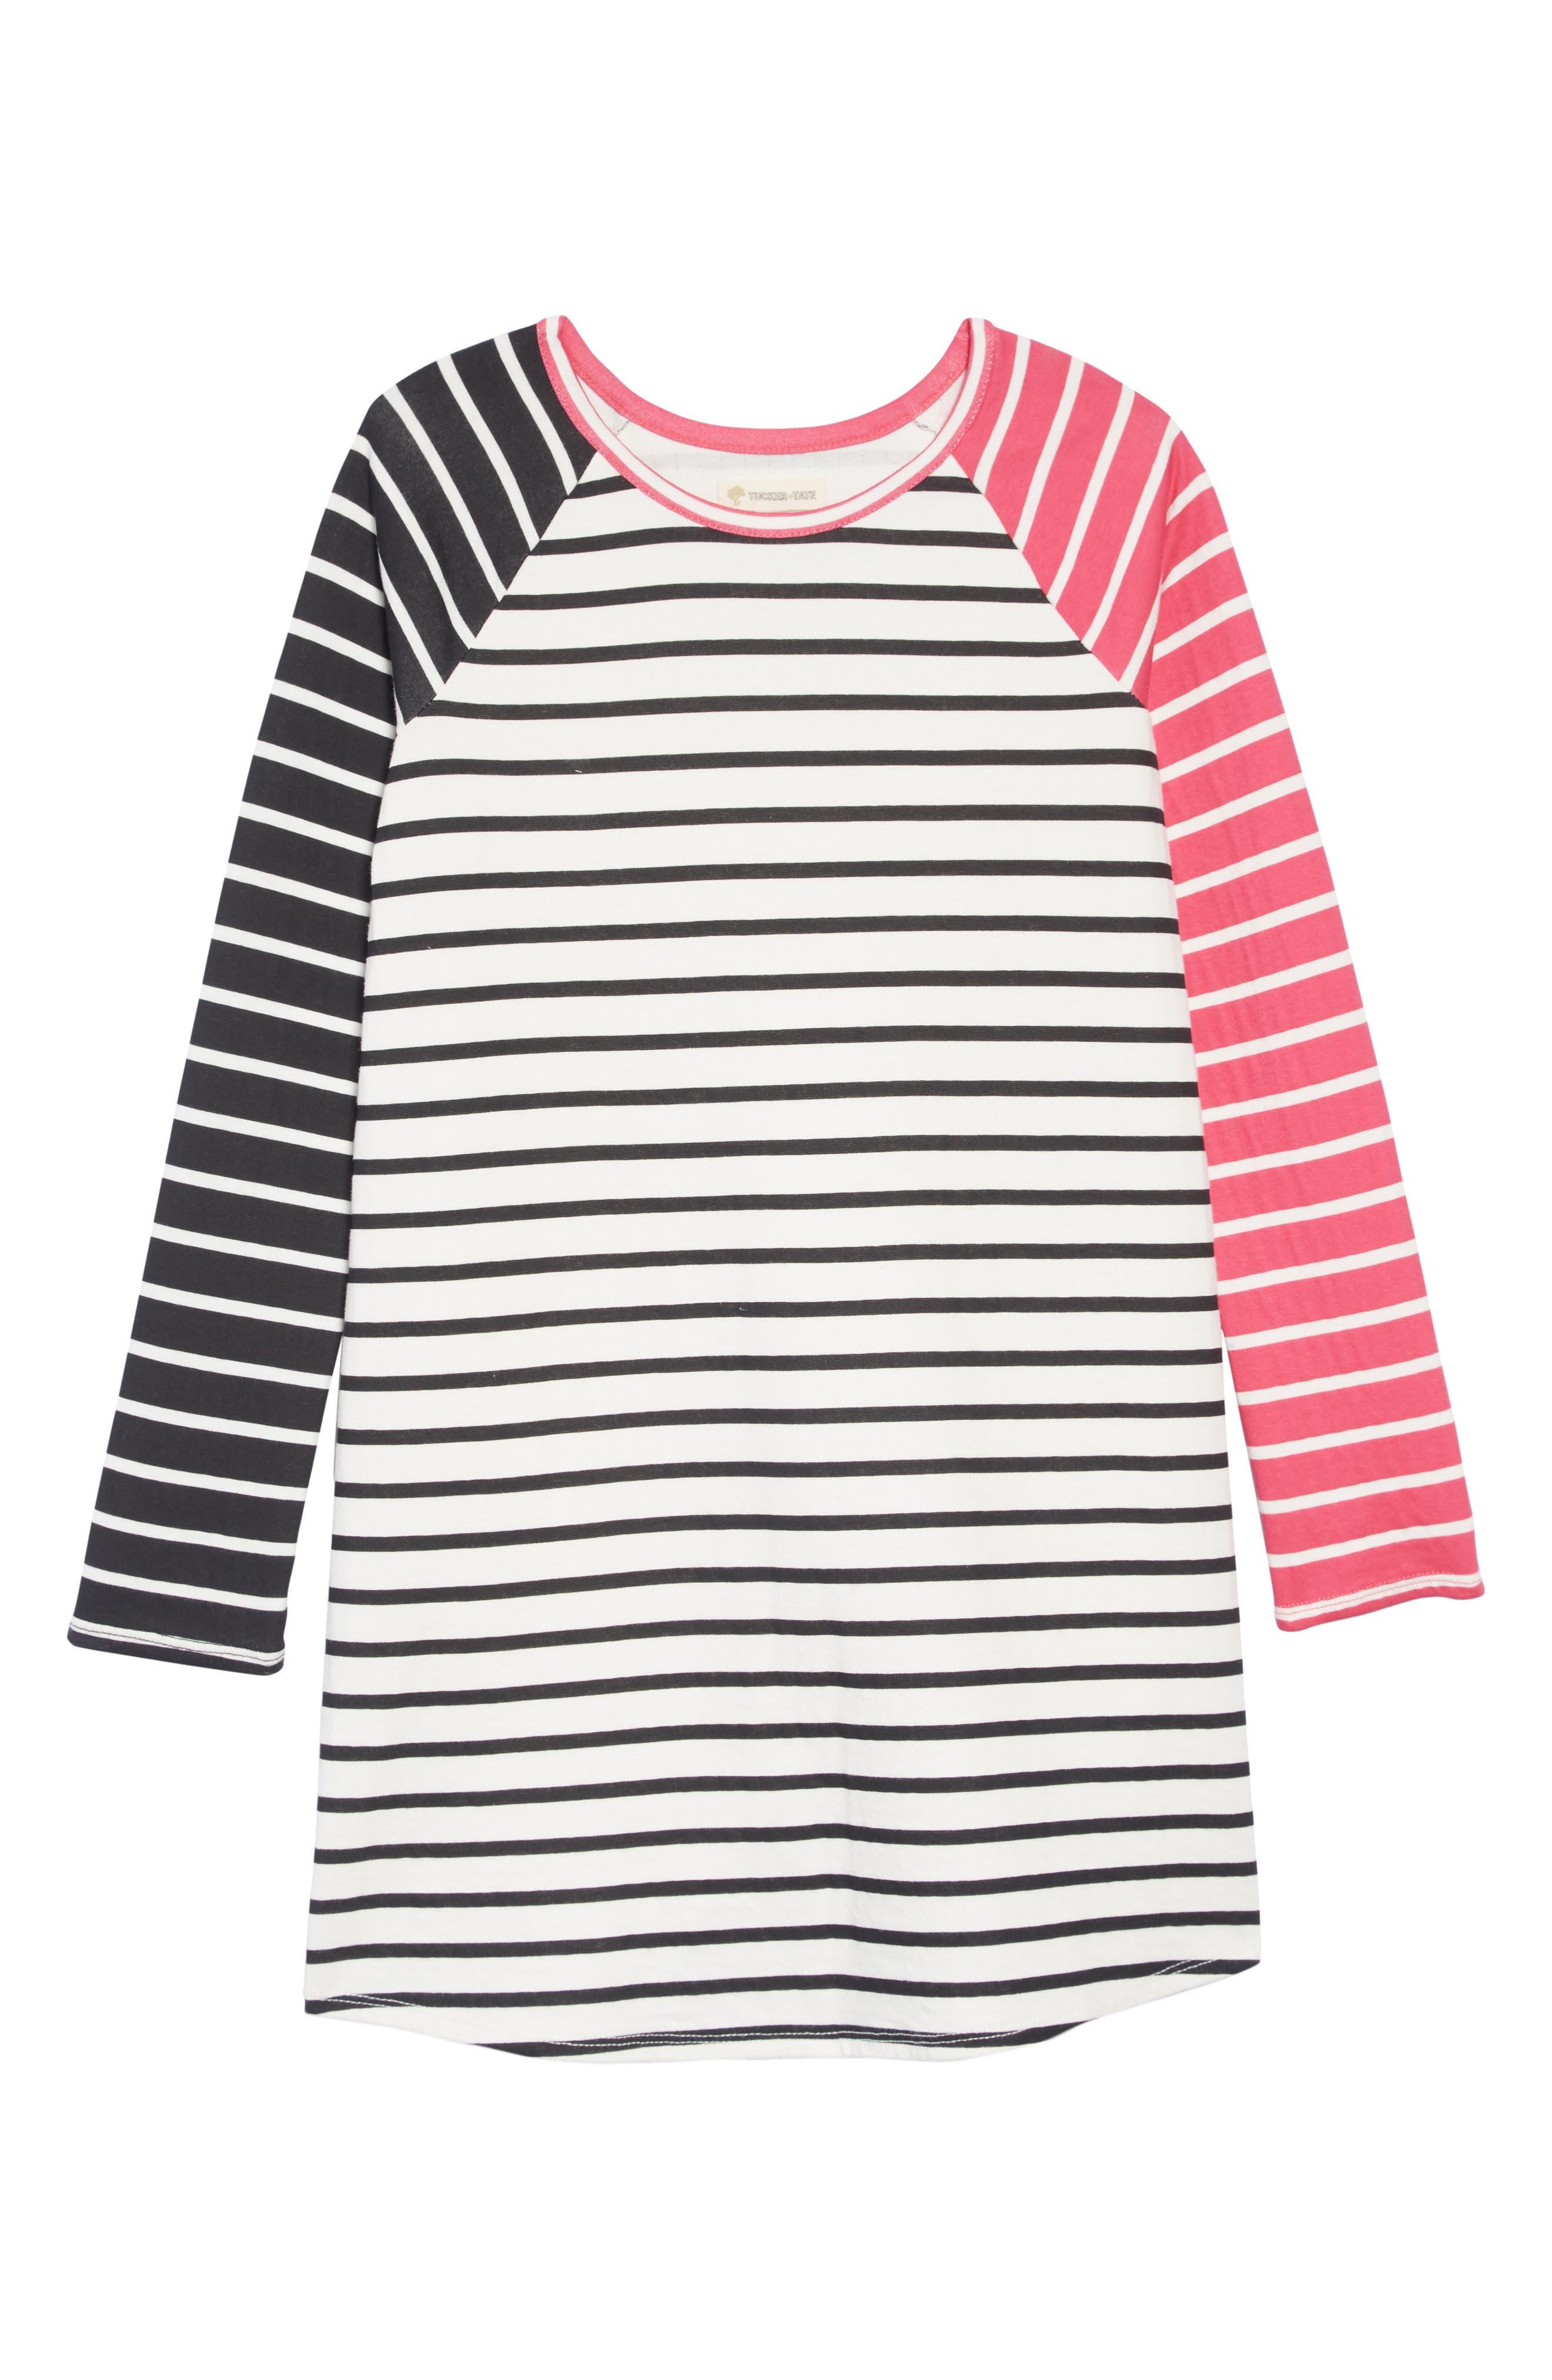 Stripe Dress,                         Main,                         color, IVORY EGRET MULTI STRIPE